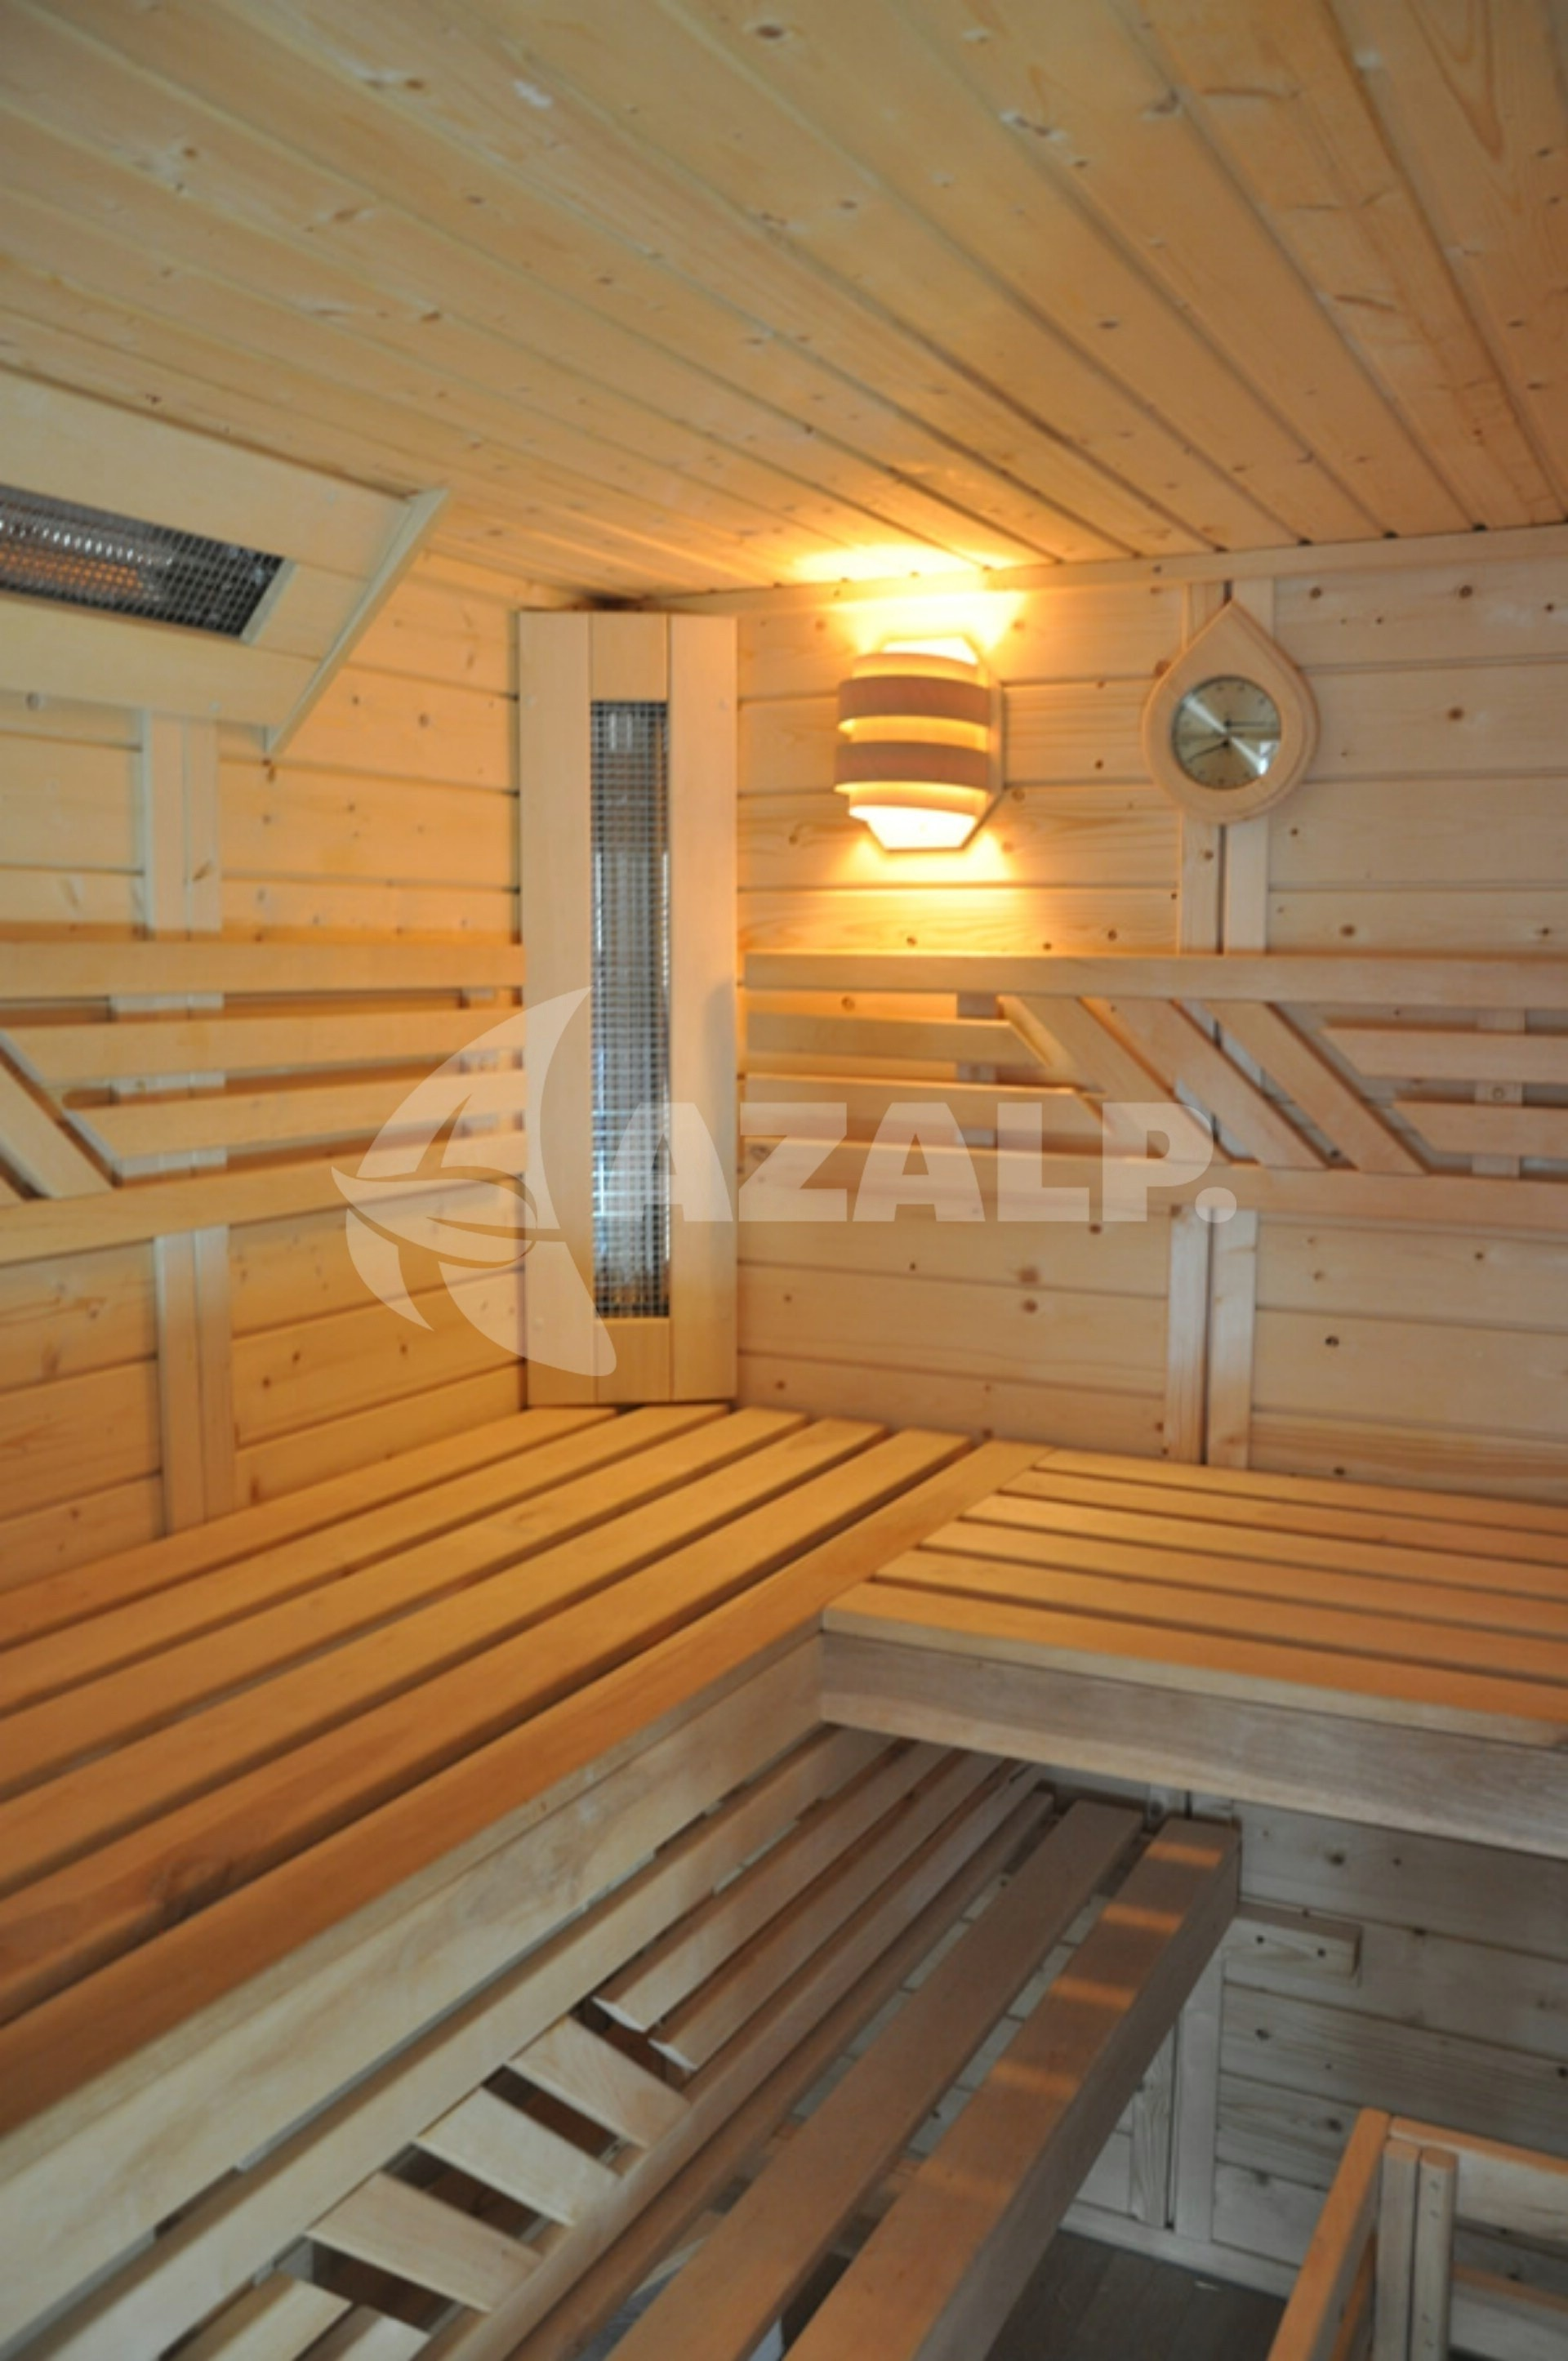 Azalp Saunabank gerade, Erle 60 cm breit Kaufen bei Azalp.de